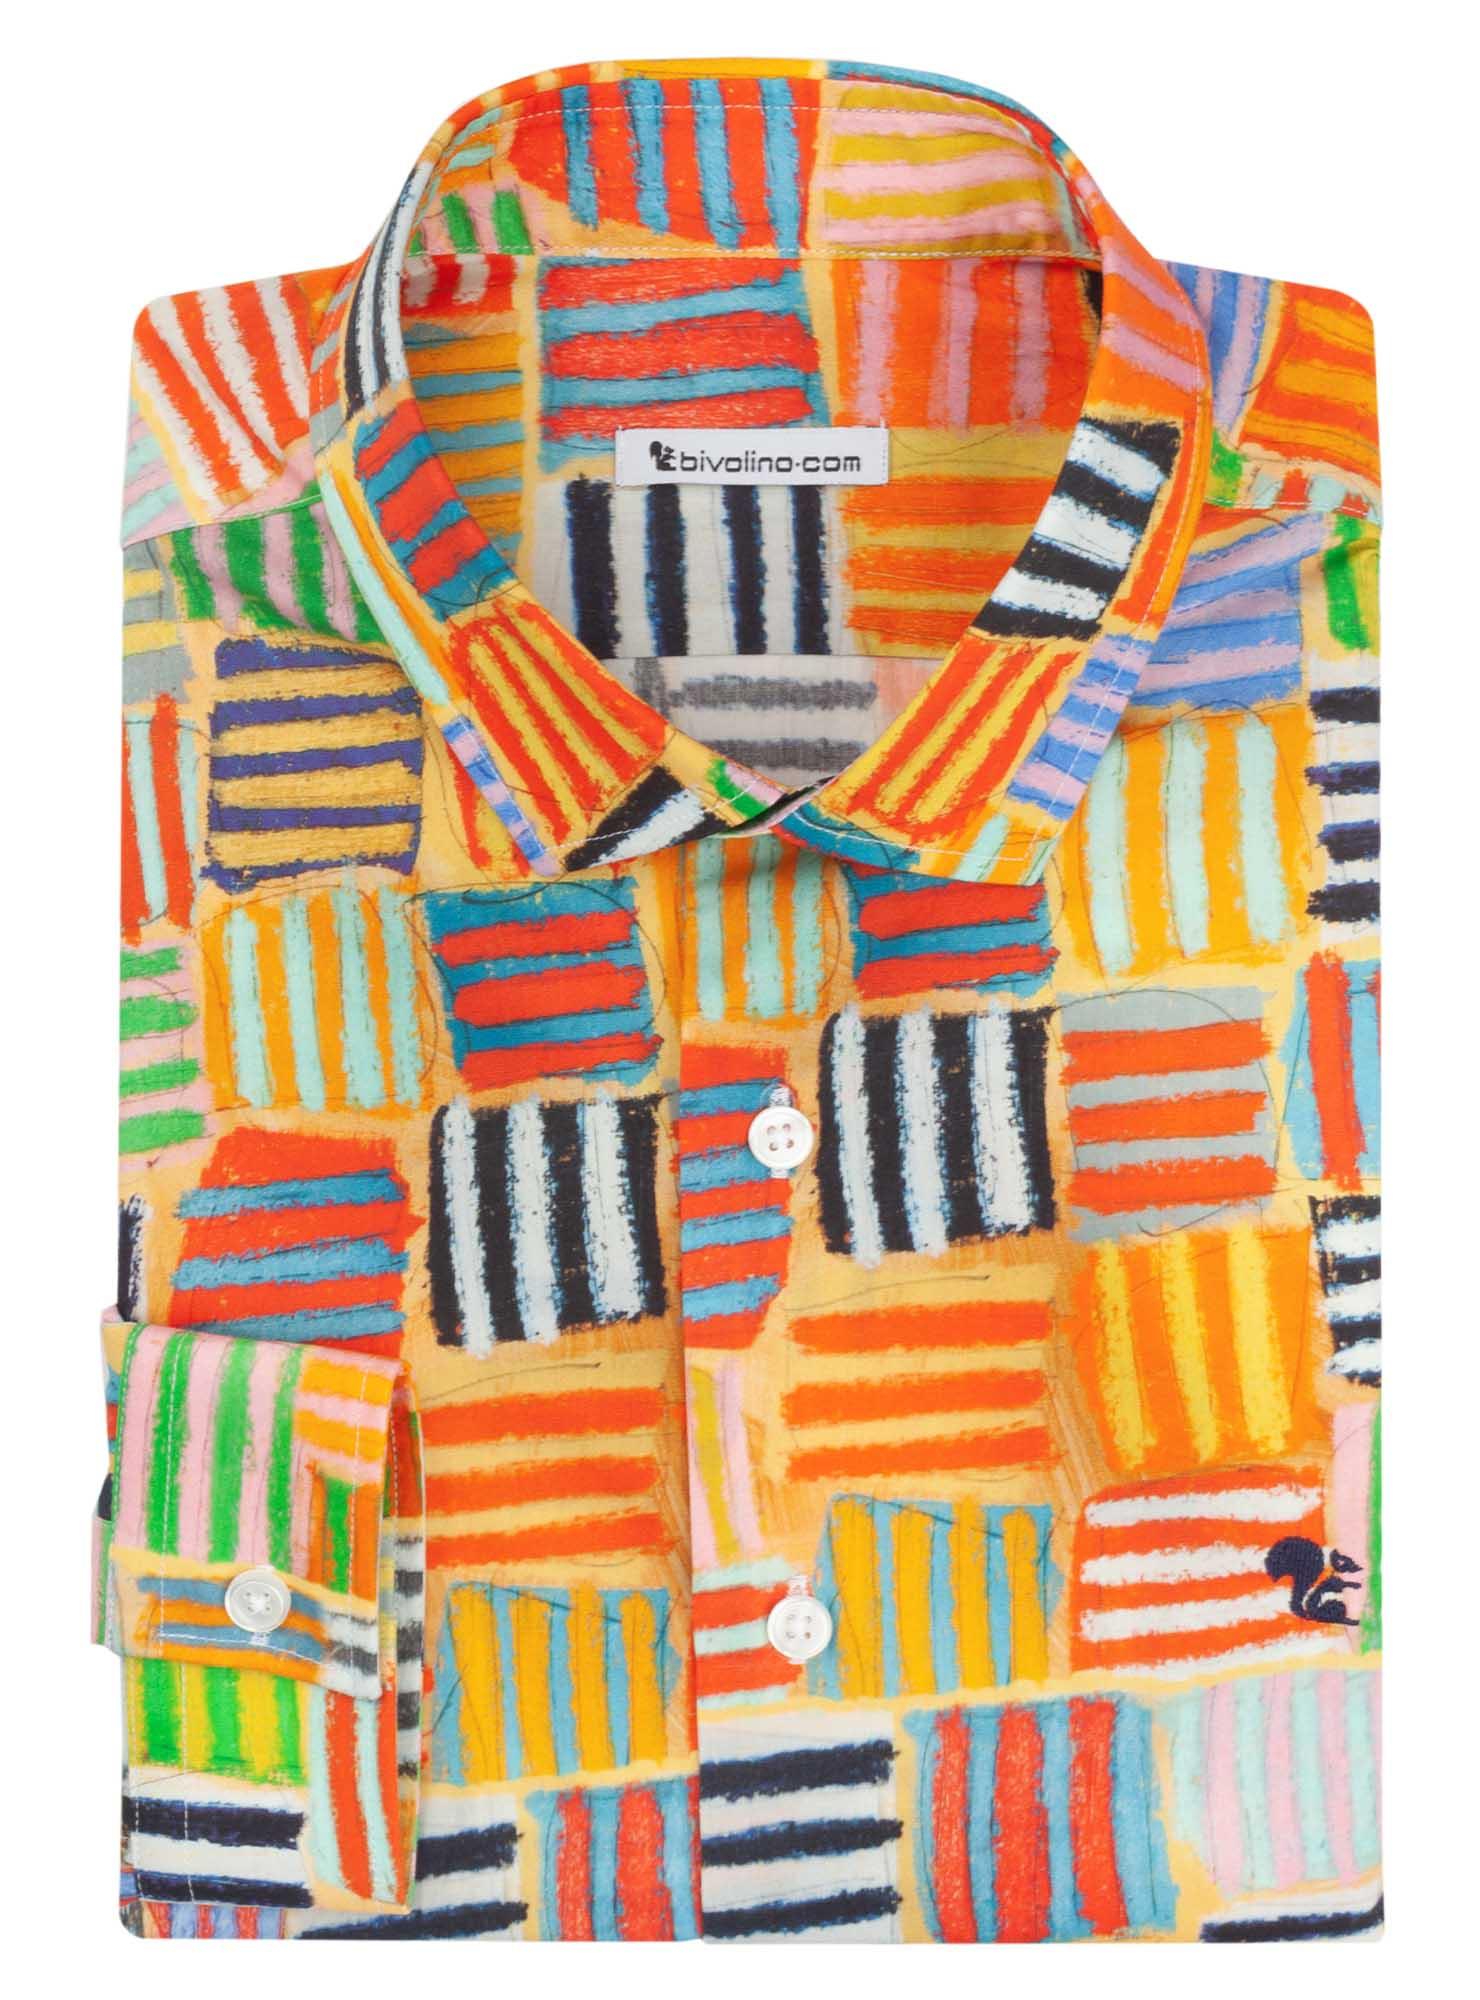 CARBONIA - ARTY-PRINT men shirt - GORDON HOPKINS 1